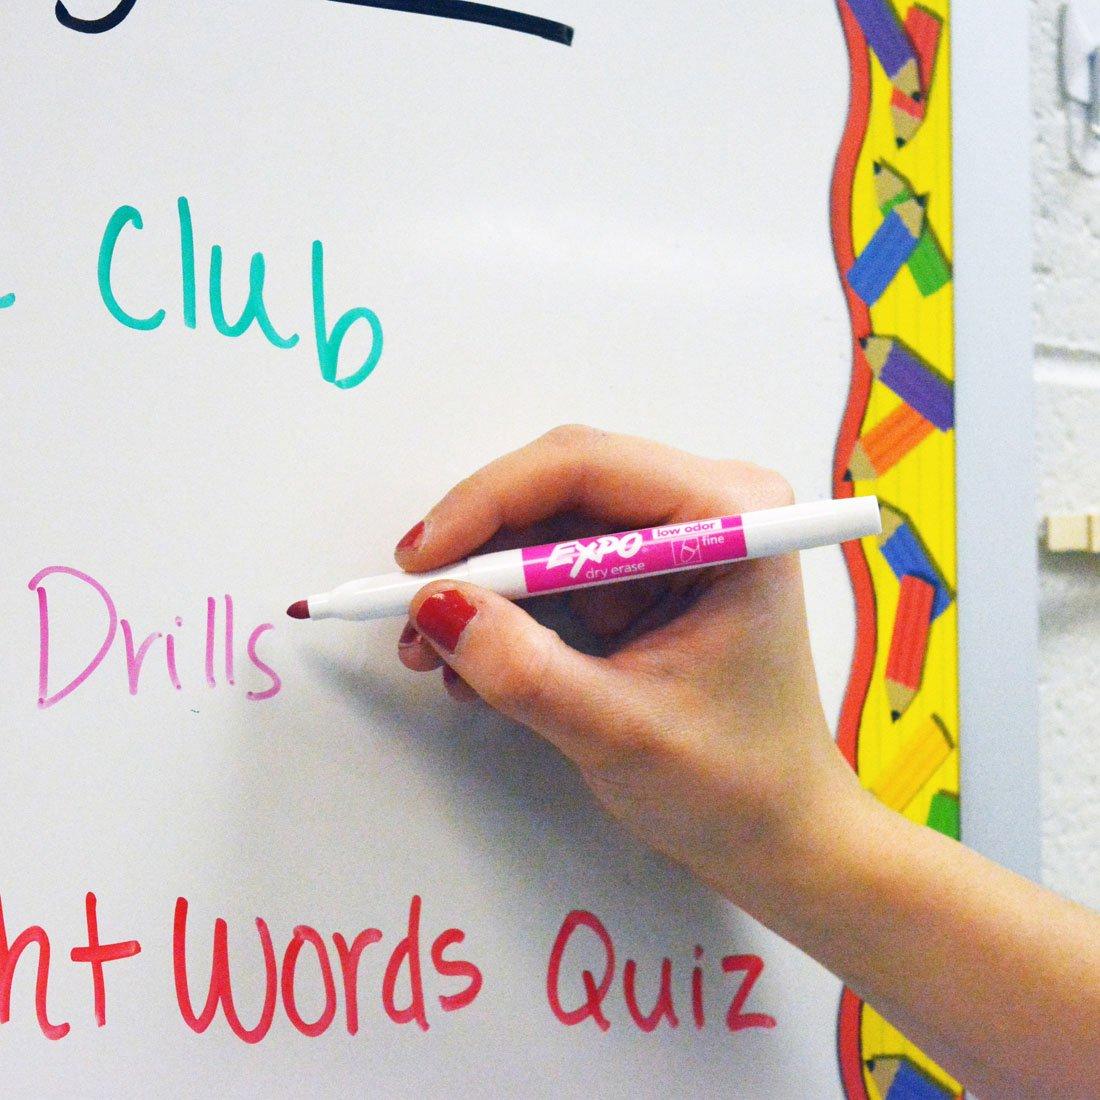 writing-on-whiteboard-in-pink-fine-expo-marker.jpg